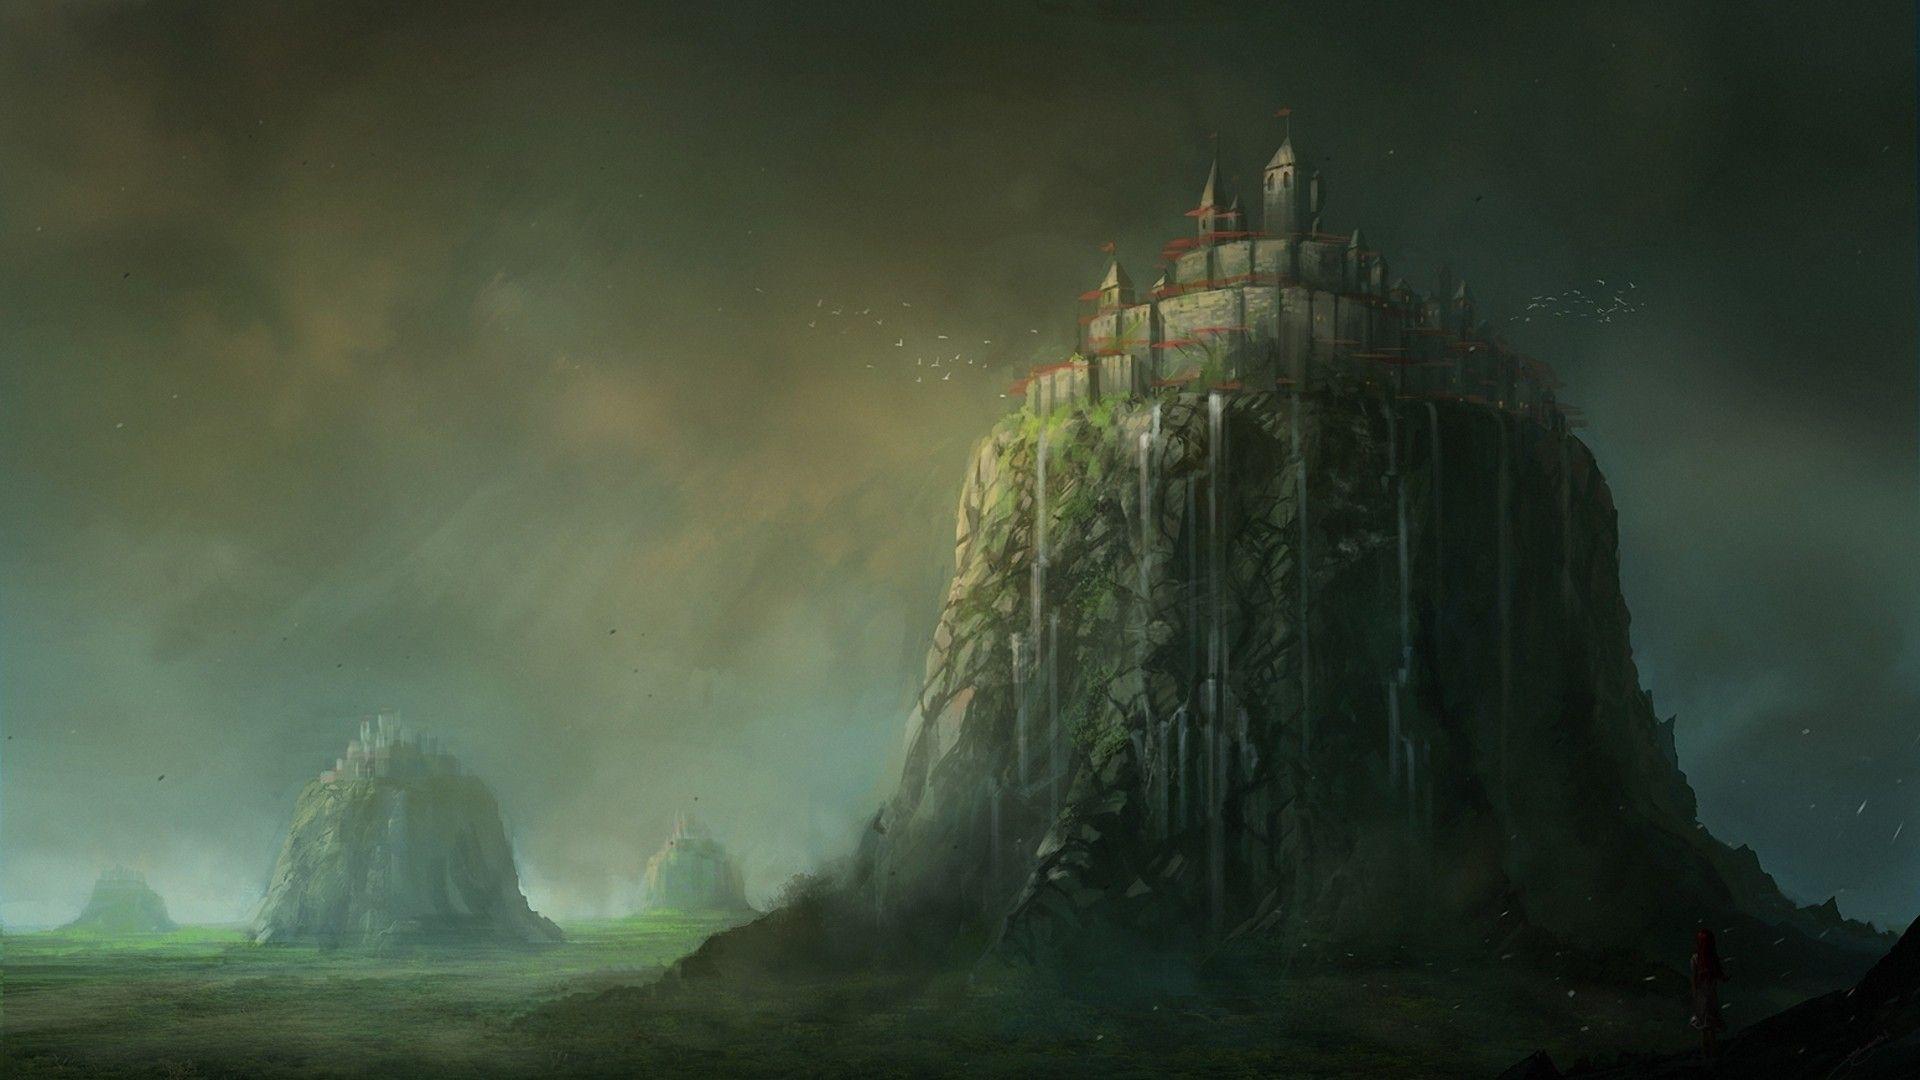 FANTASY CASTLES wallpaper fantasy castles castle images 1920x1080